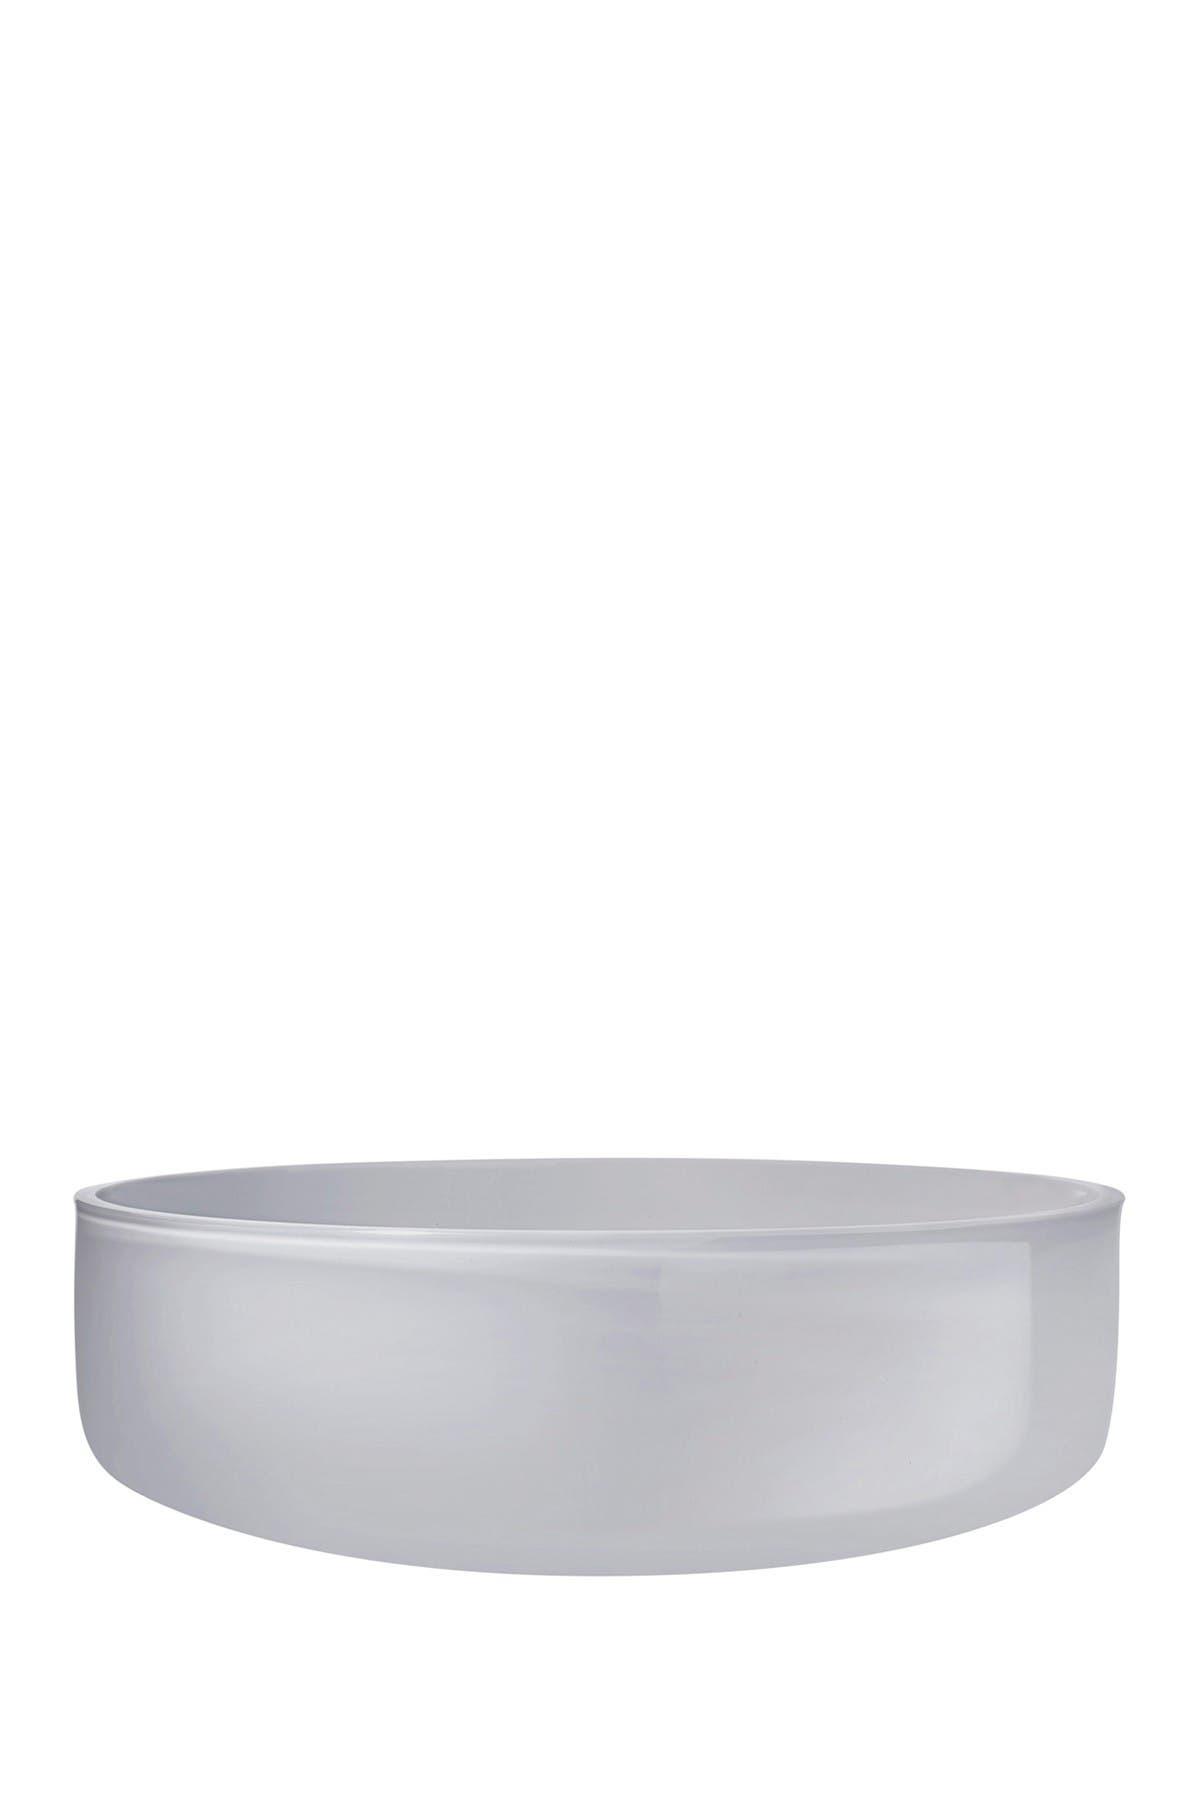 Image of Nude Glass Midnight Bowl - Medium - Opal Grey